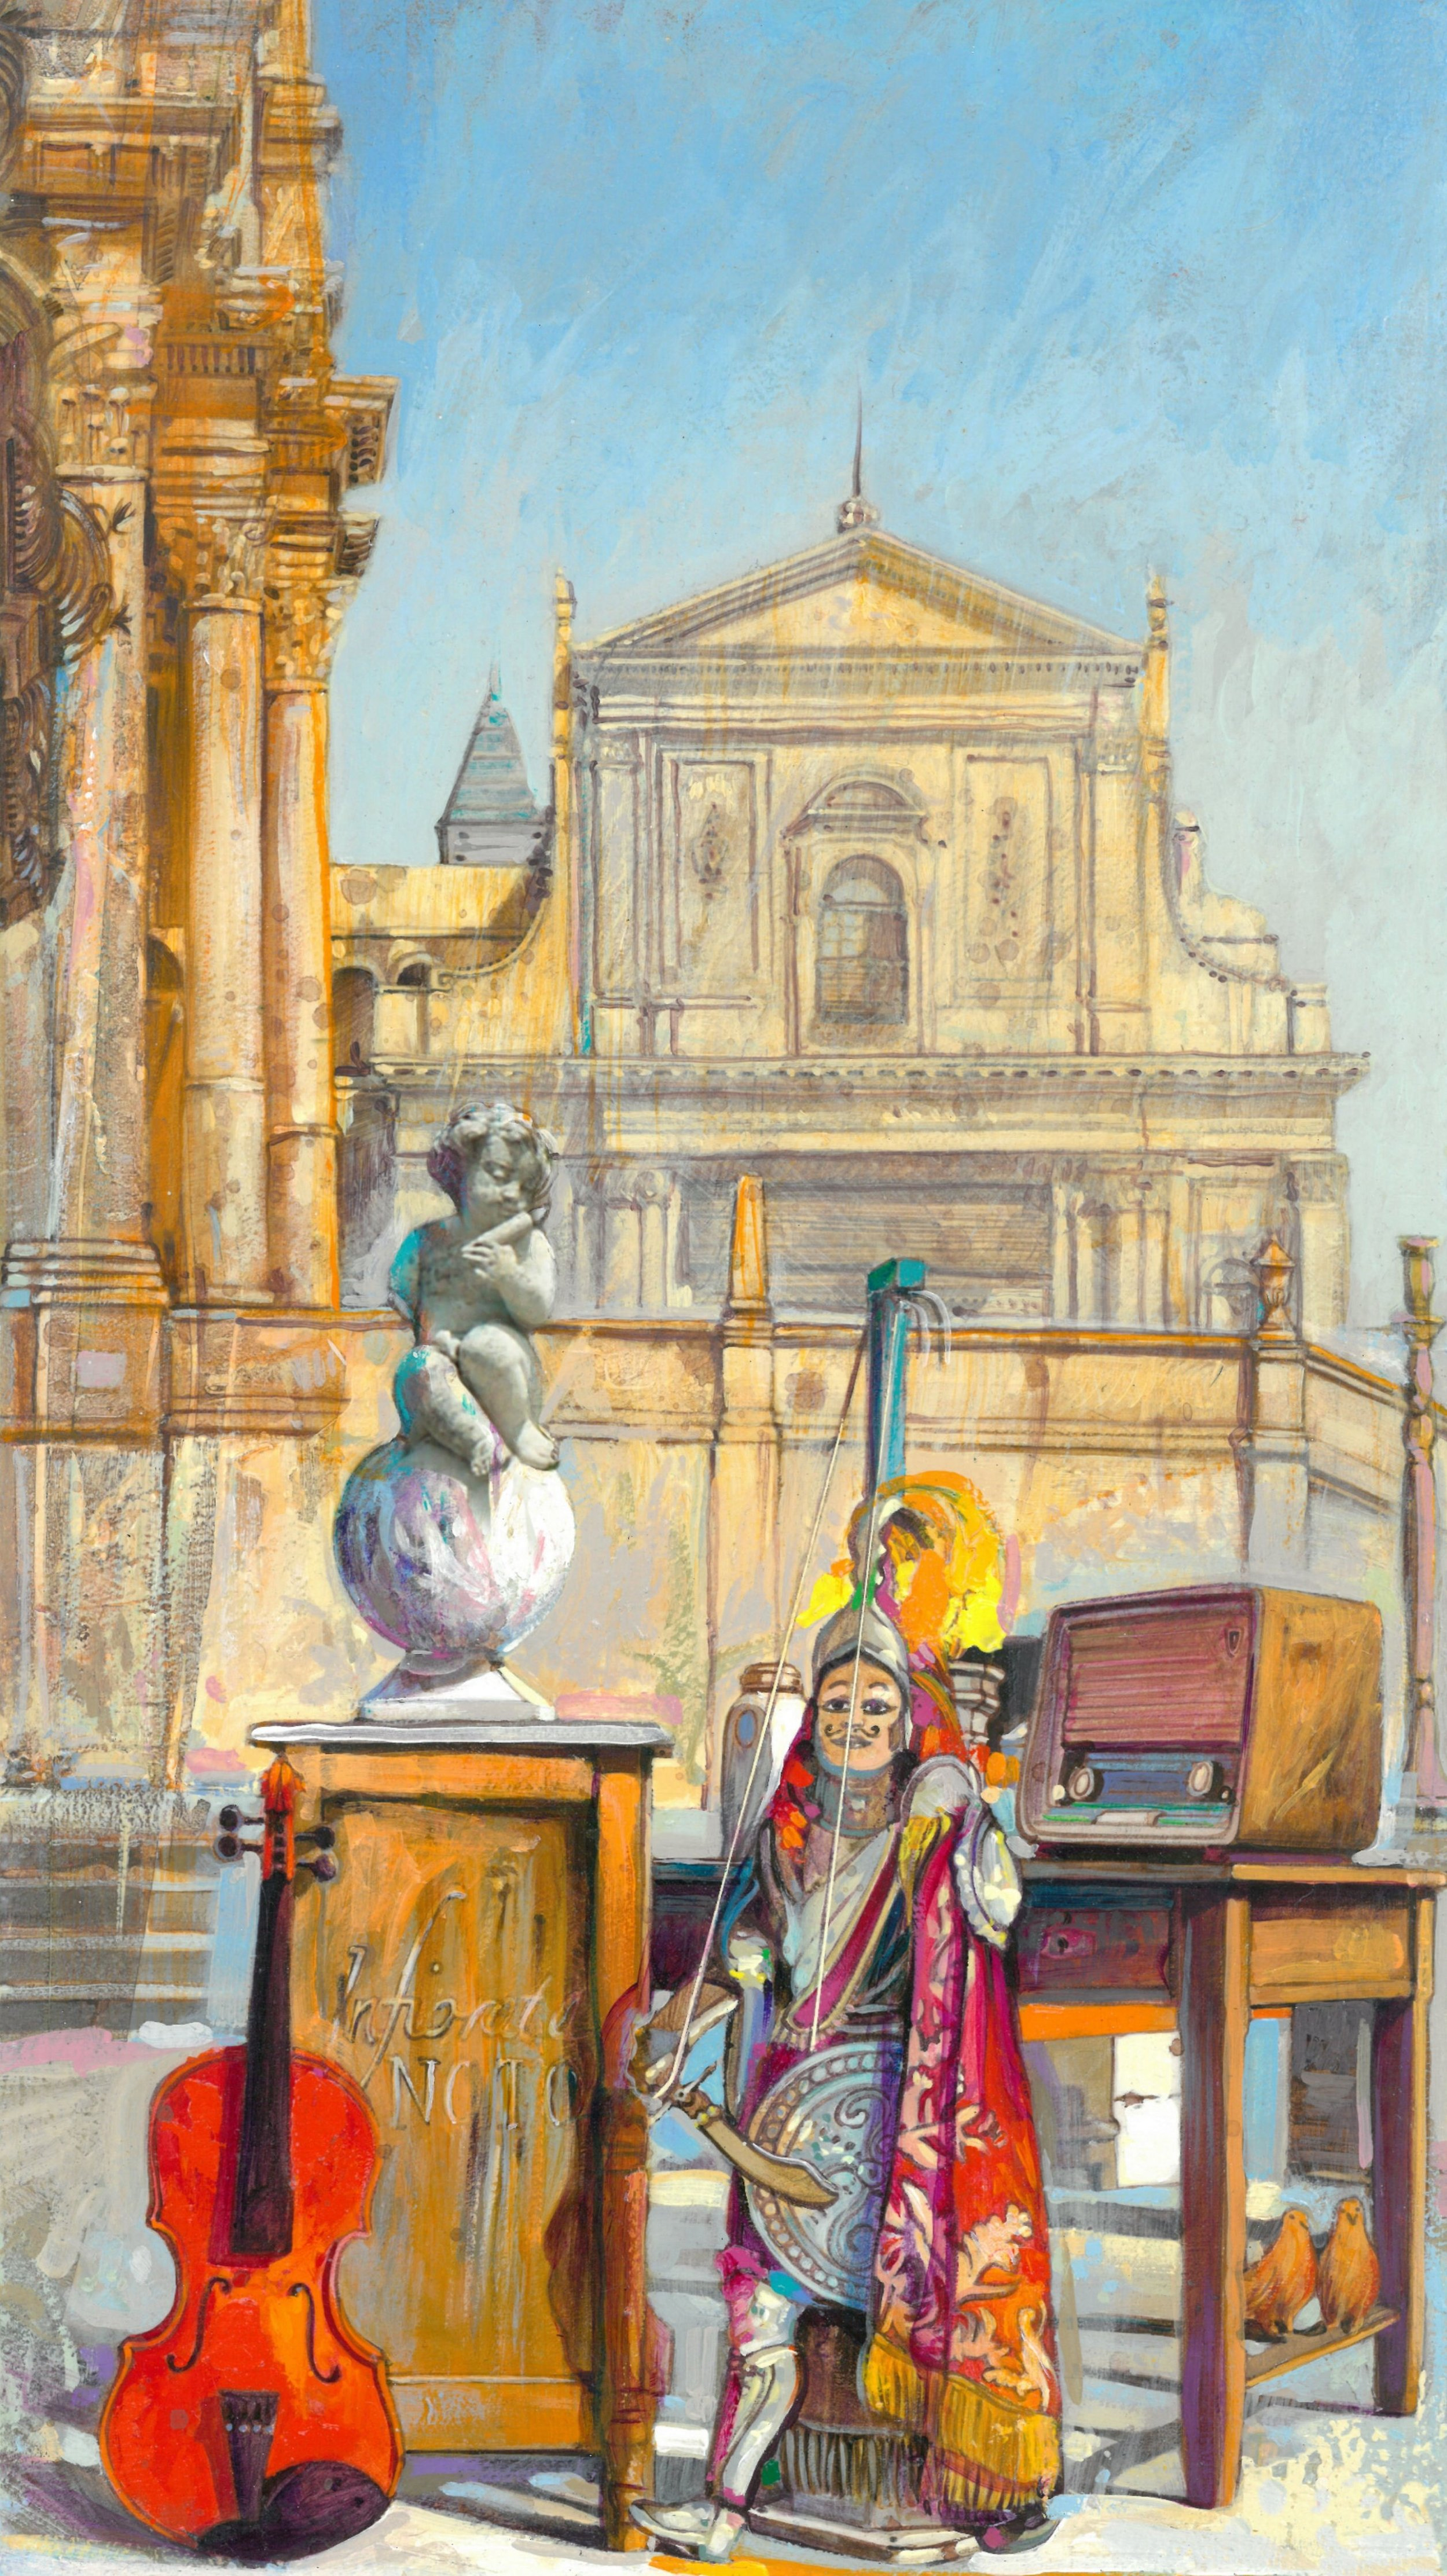 Noto, via Nicolaci   Acrilico su tavola - 25x50 cm